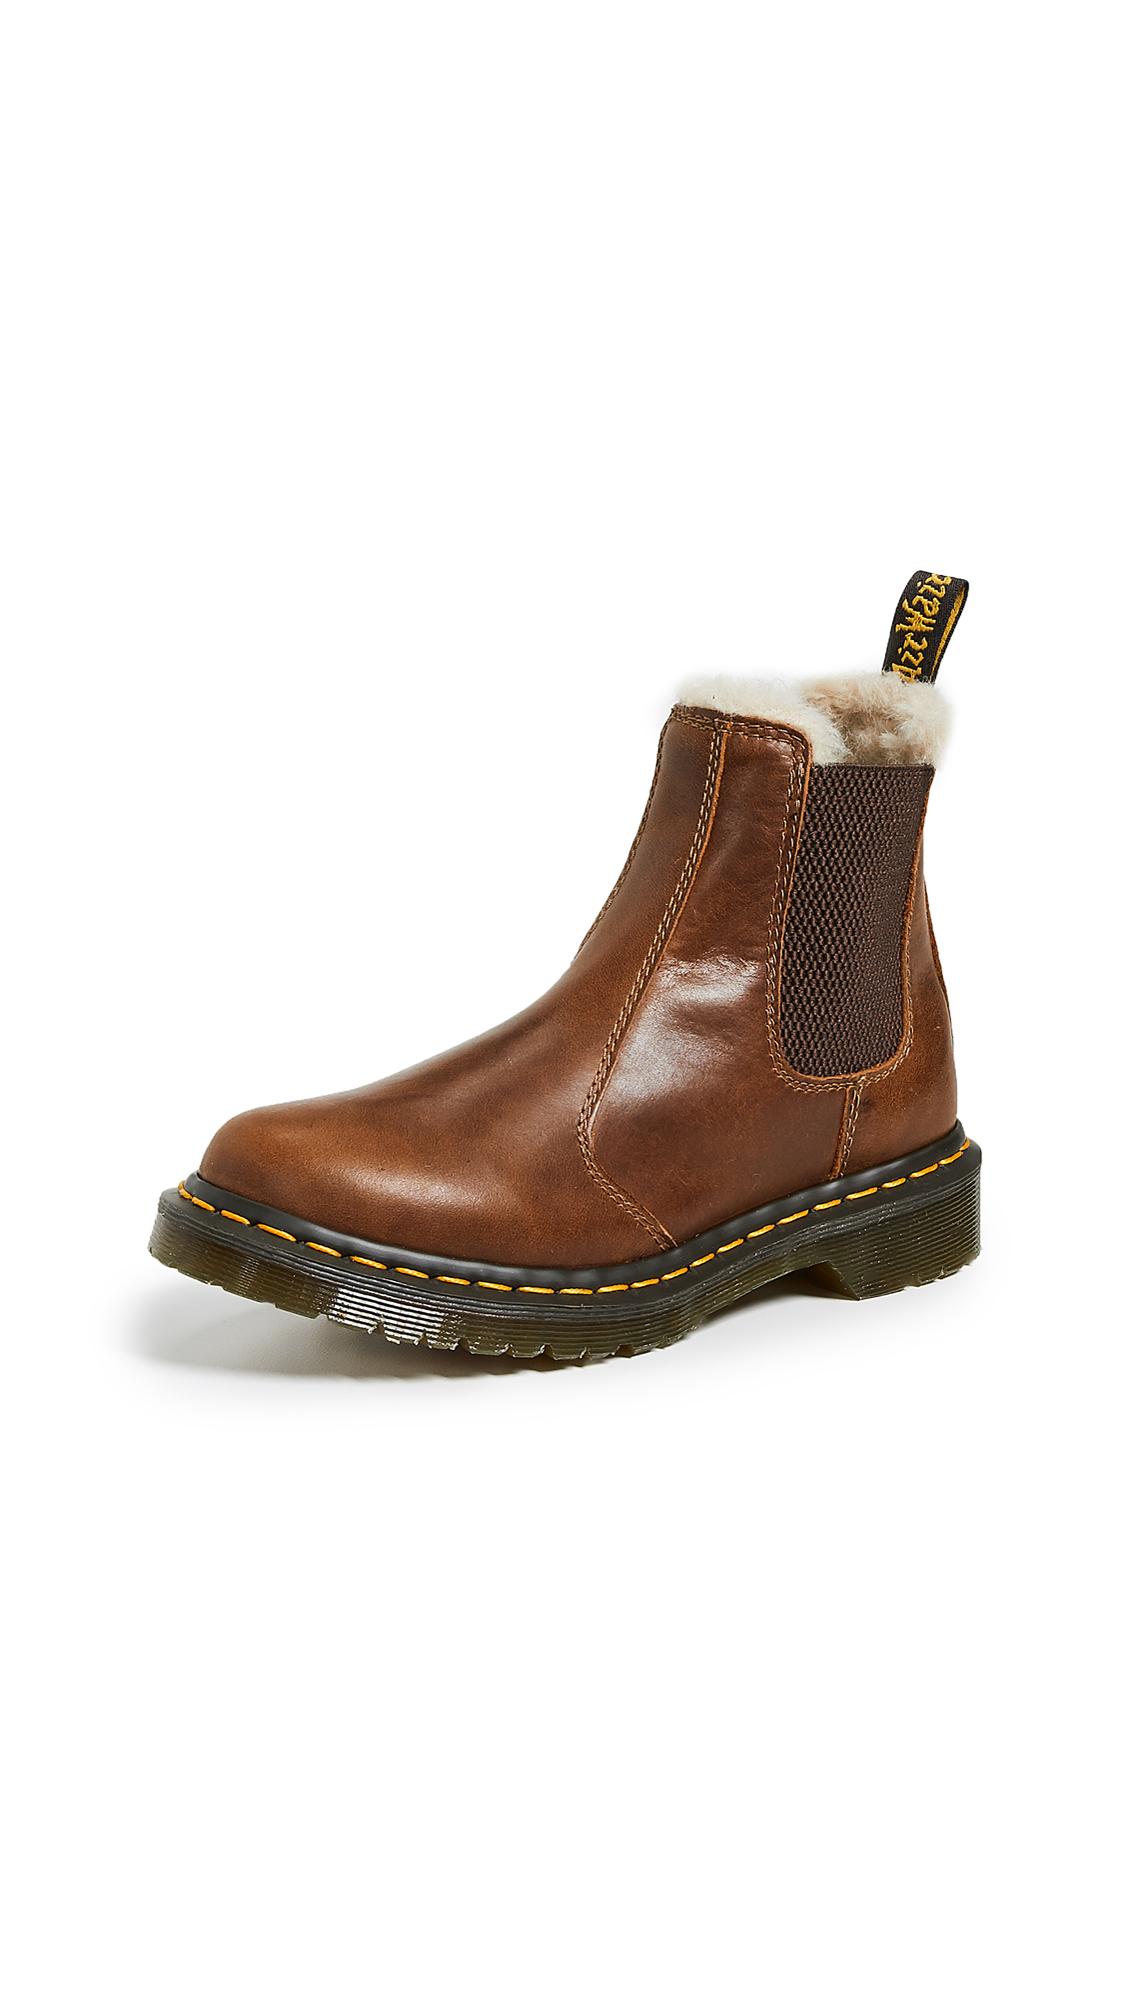 Dr. Martens Leonore Sherpa Chelsea Boots - Butterscotch